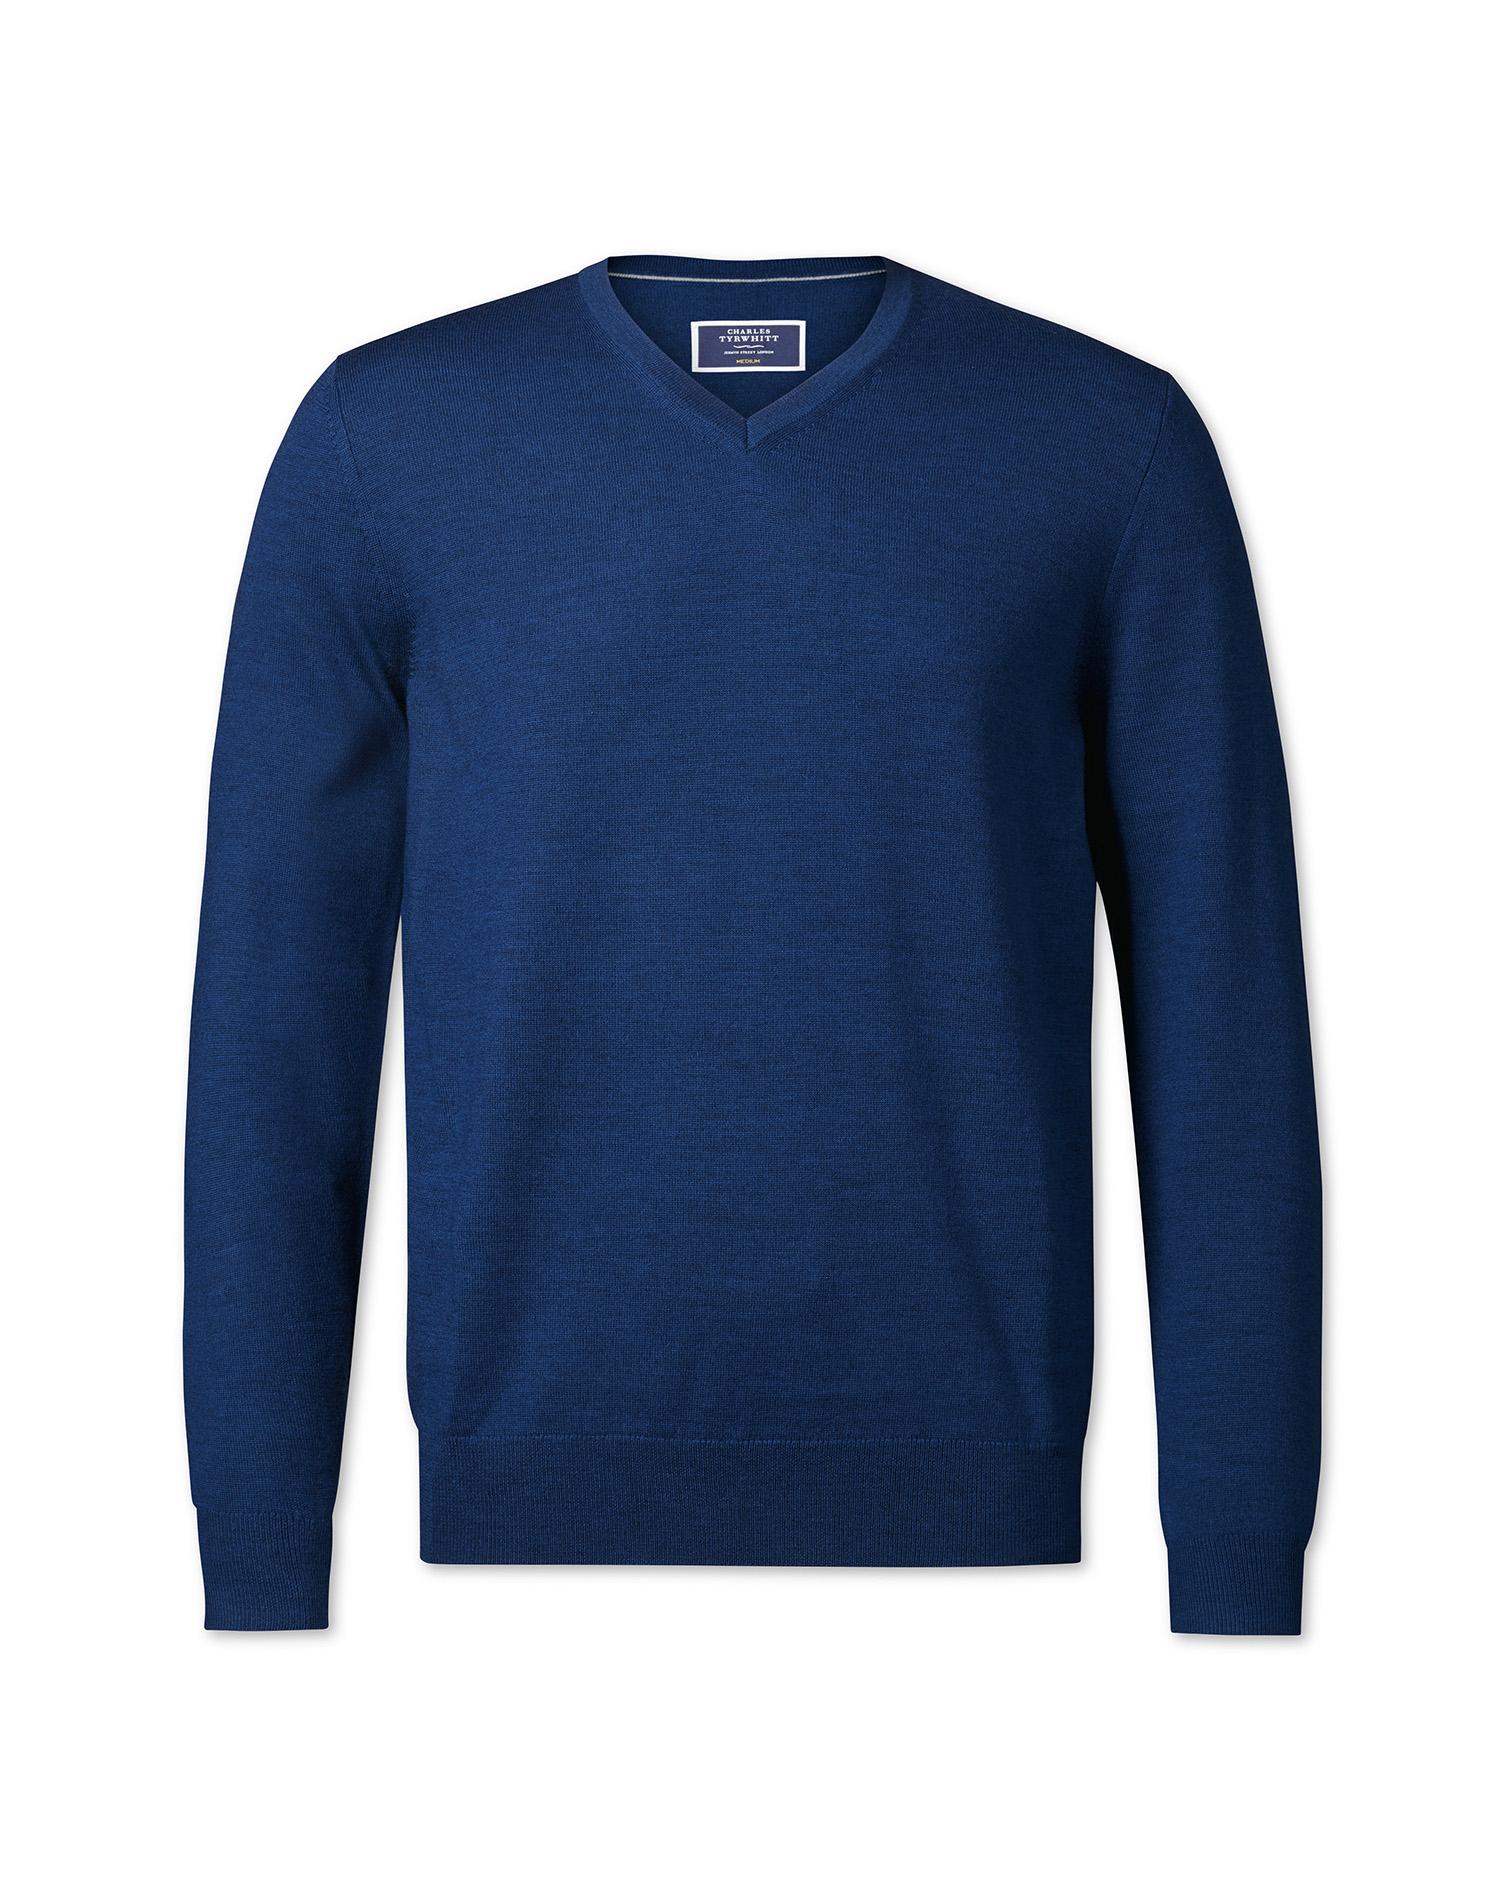 Royal Blue V-Neck Merino Wool Jumper Size Medium by Charles Tyrwhitt